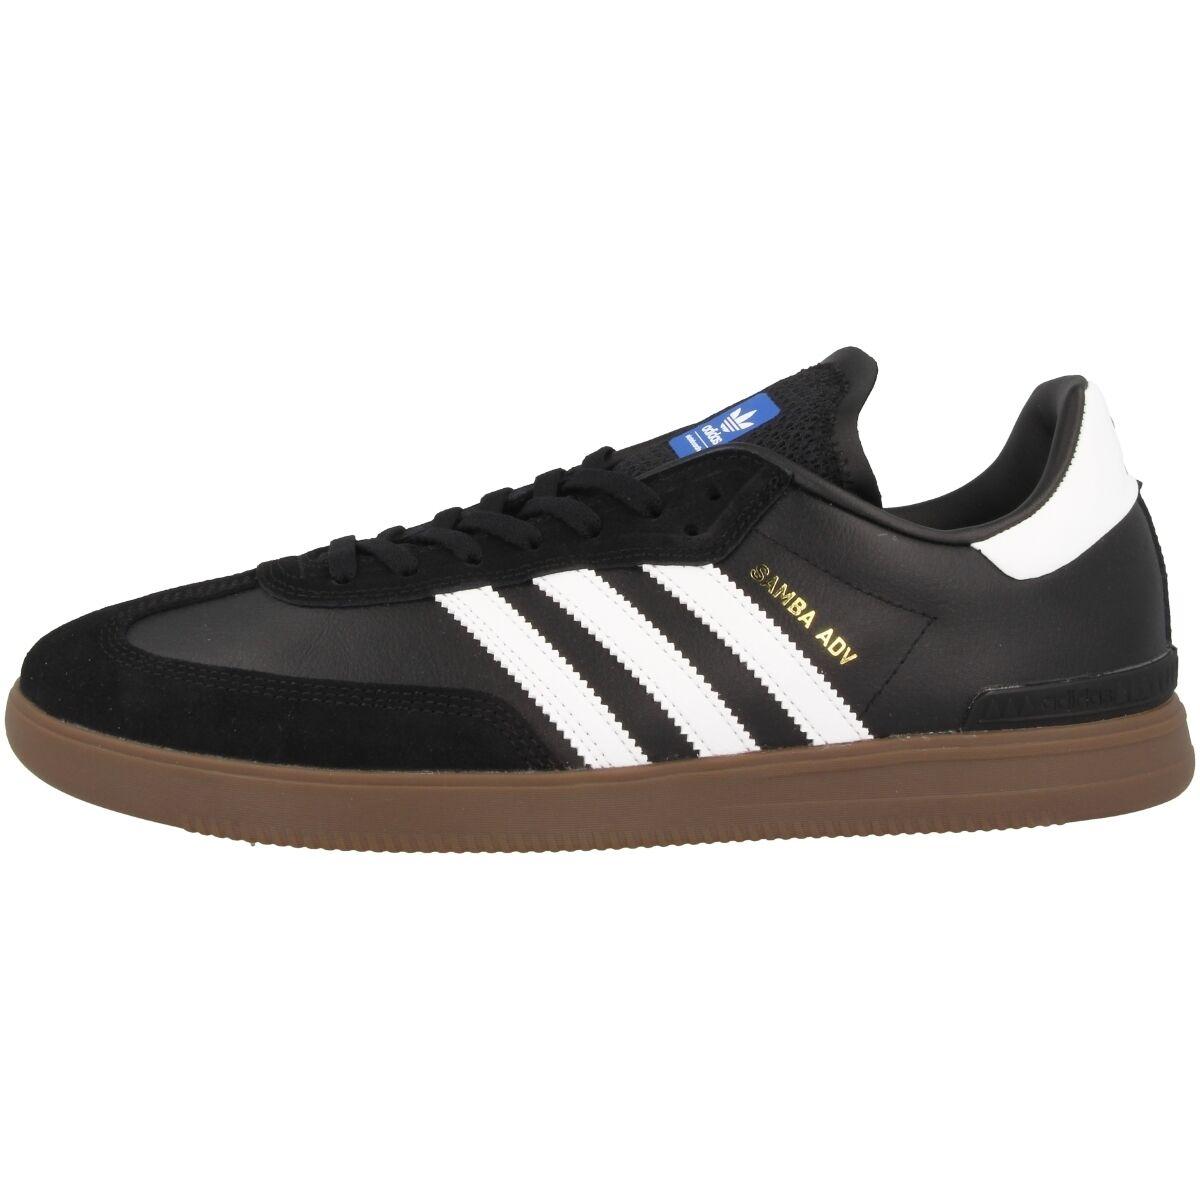 adidas samba top adv chaussures originales niedrigen top samba - skate - korb noir bb8685 473088